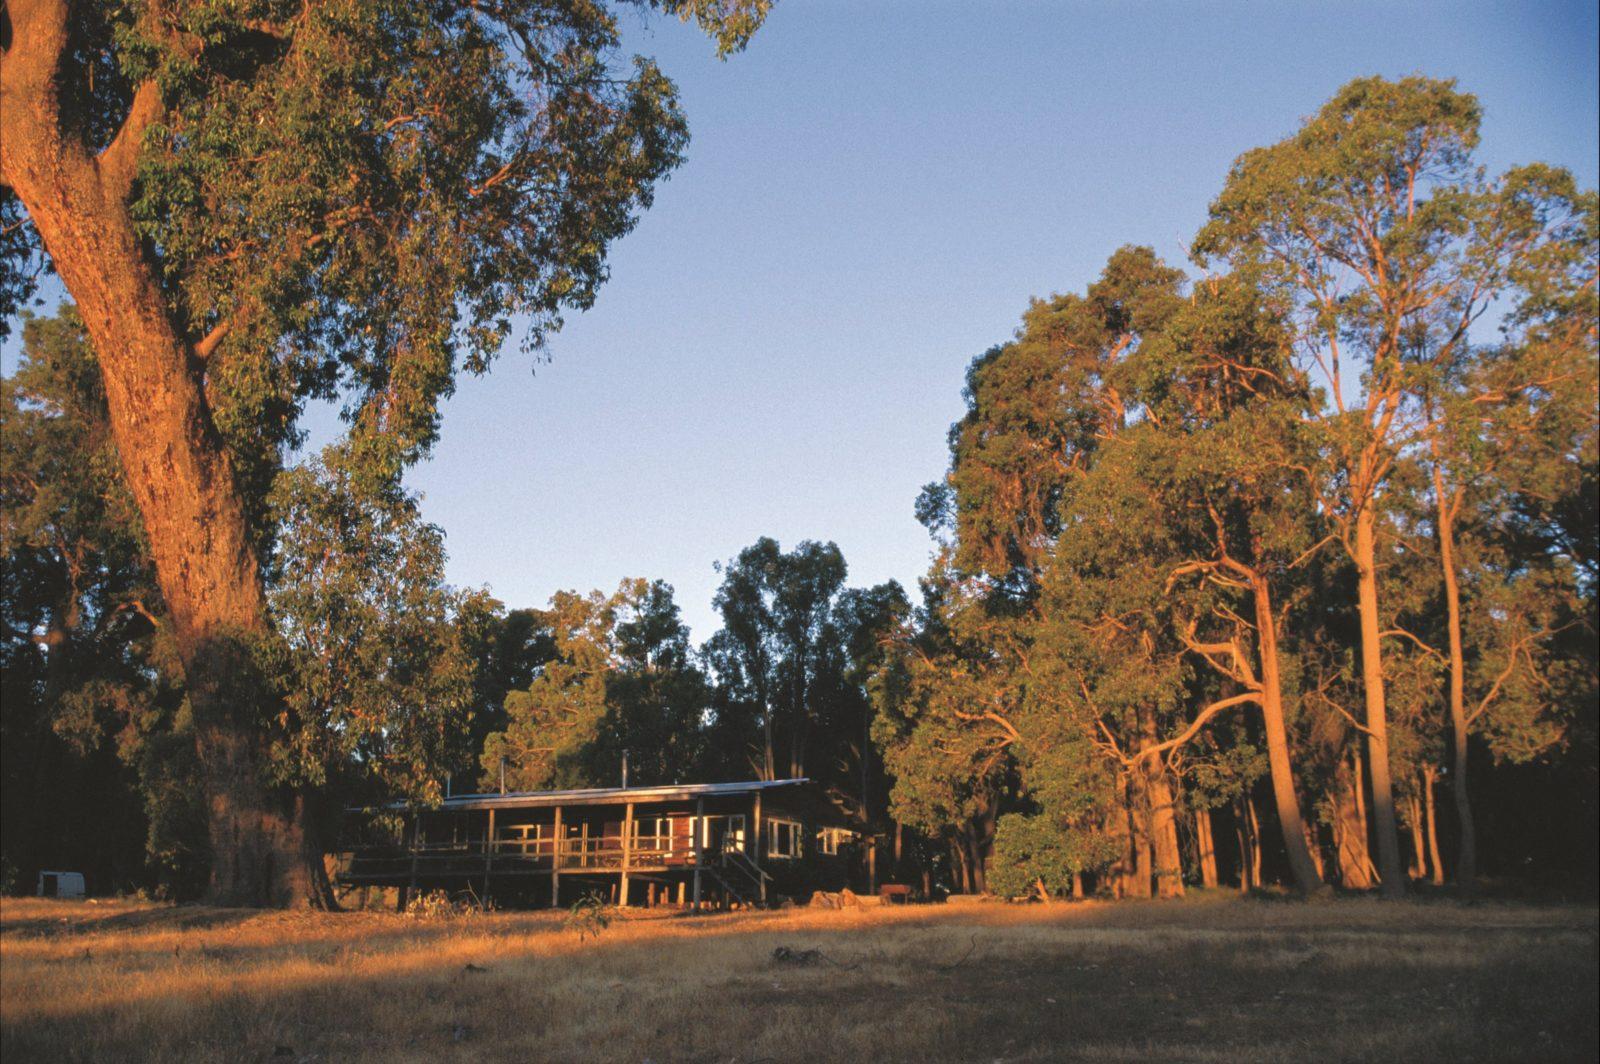 Karakamia Sanctuary, Chidlow, Western Australia